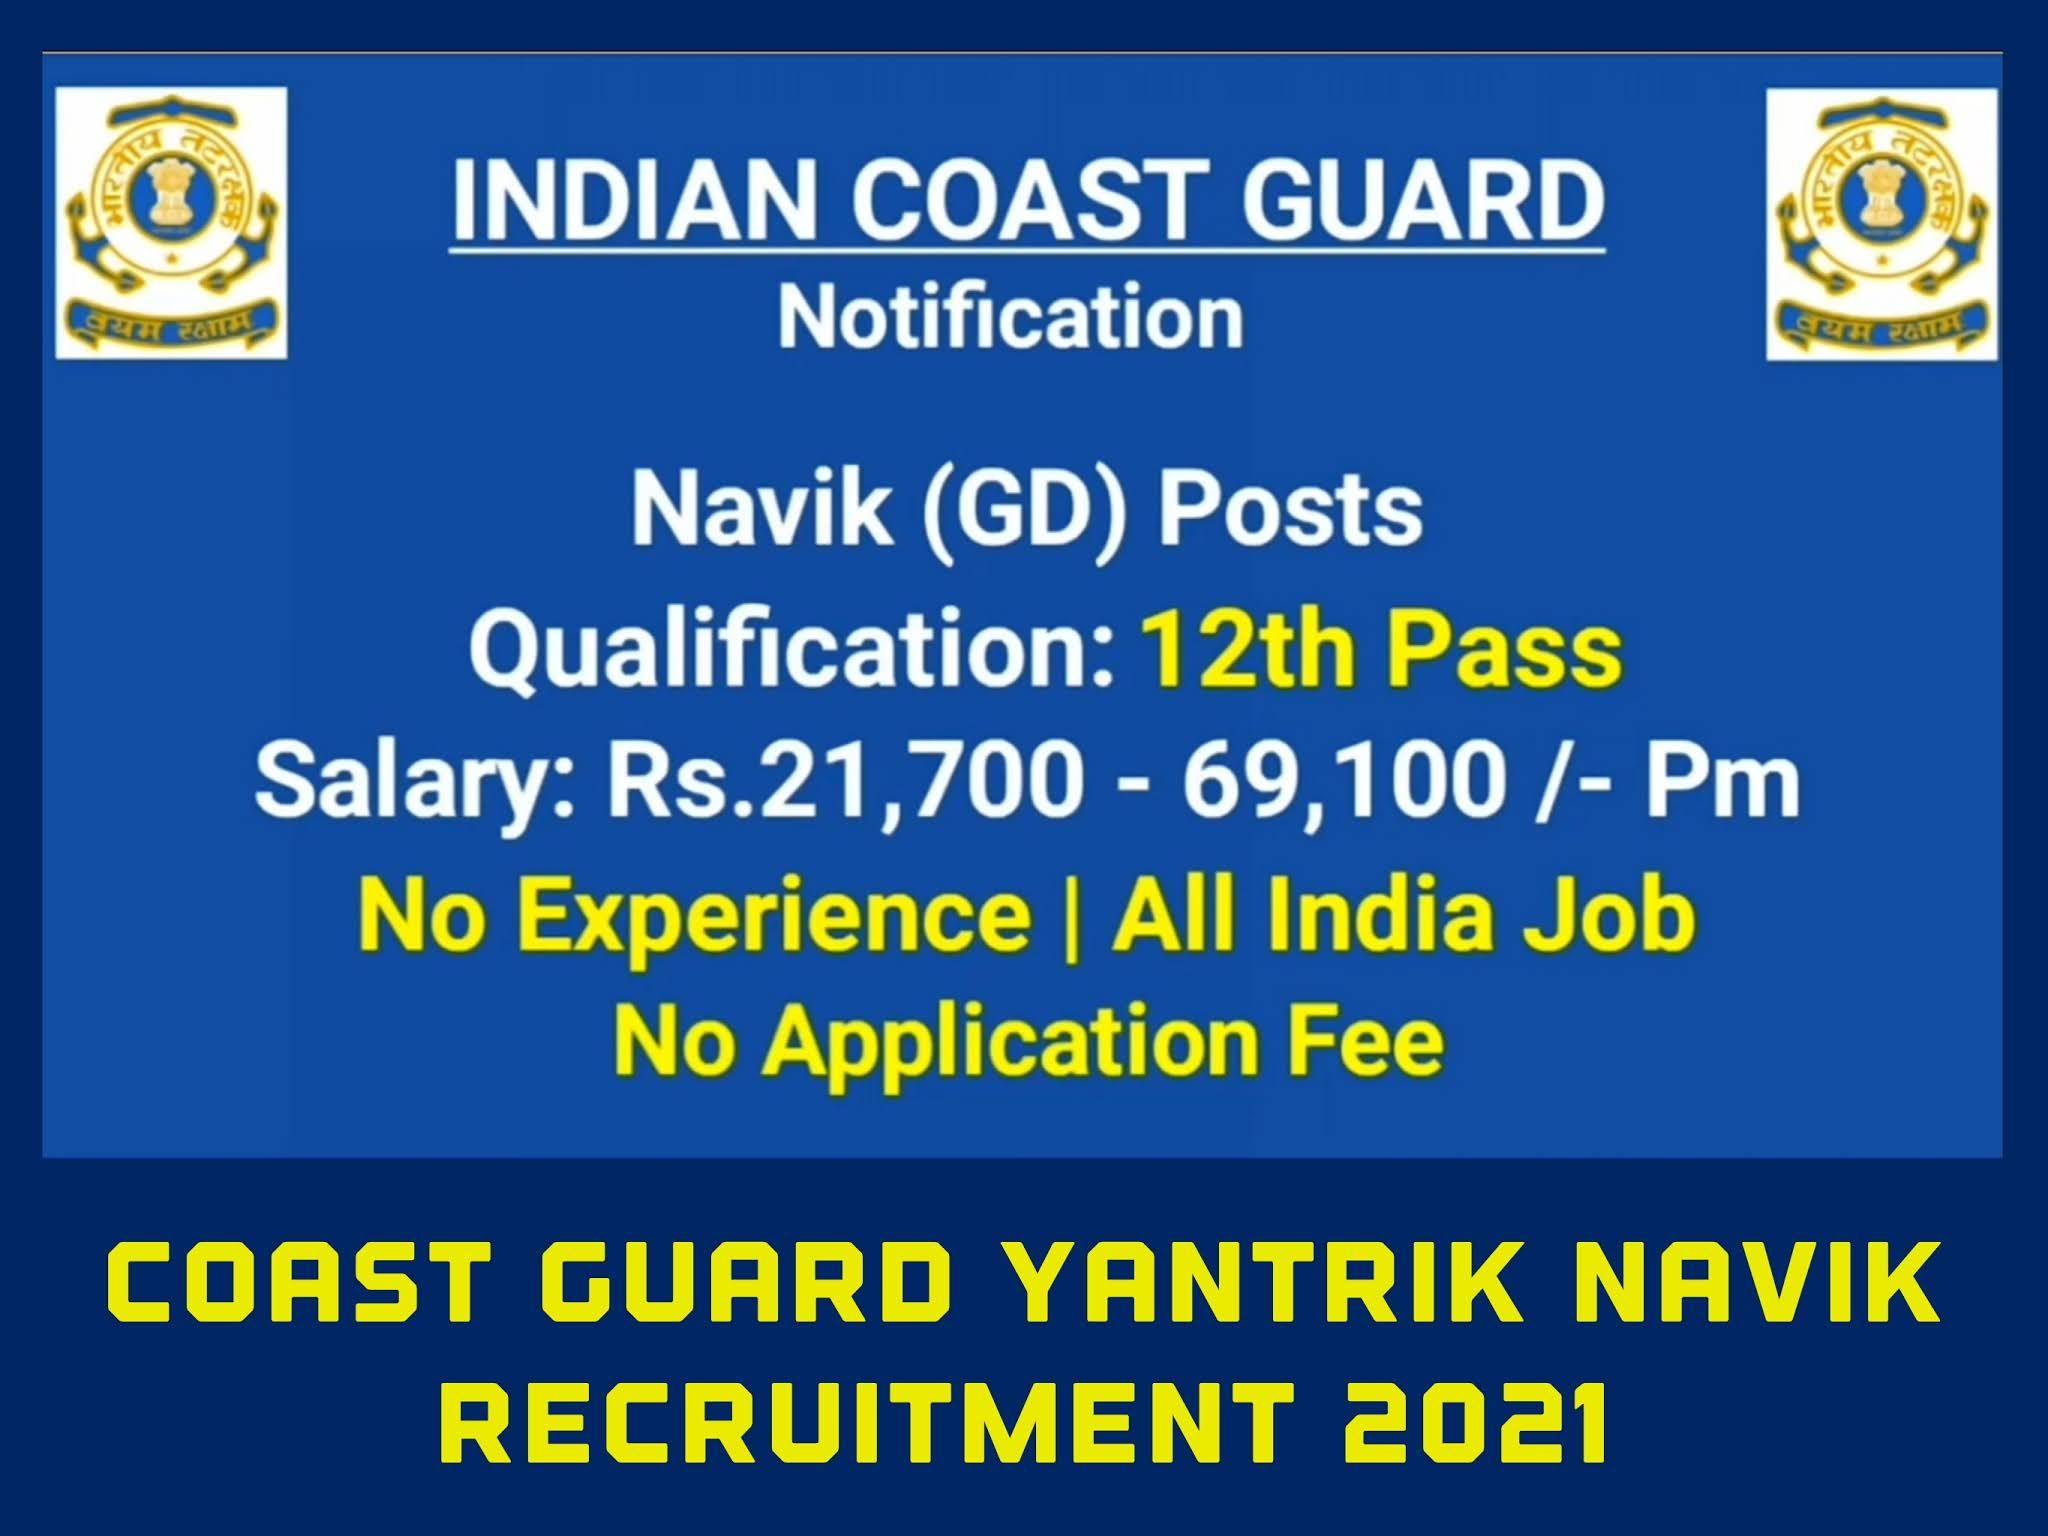 Coast Guard Yantrik Navik Recruitment 2021 | Apply Online for 358 Posts